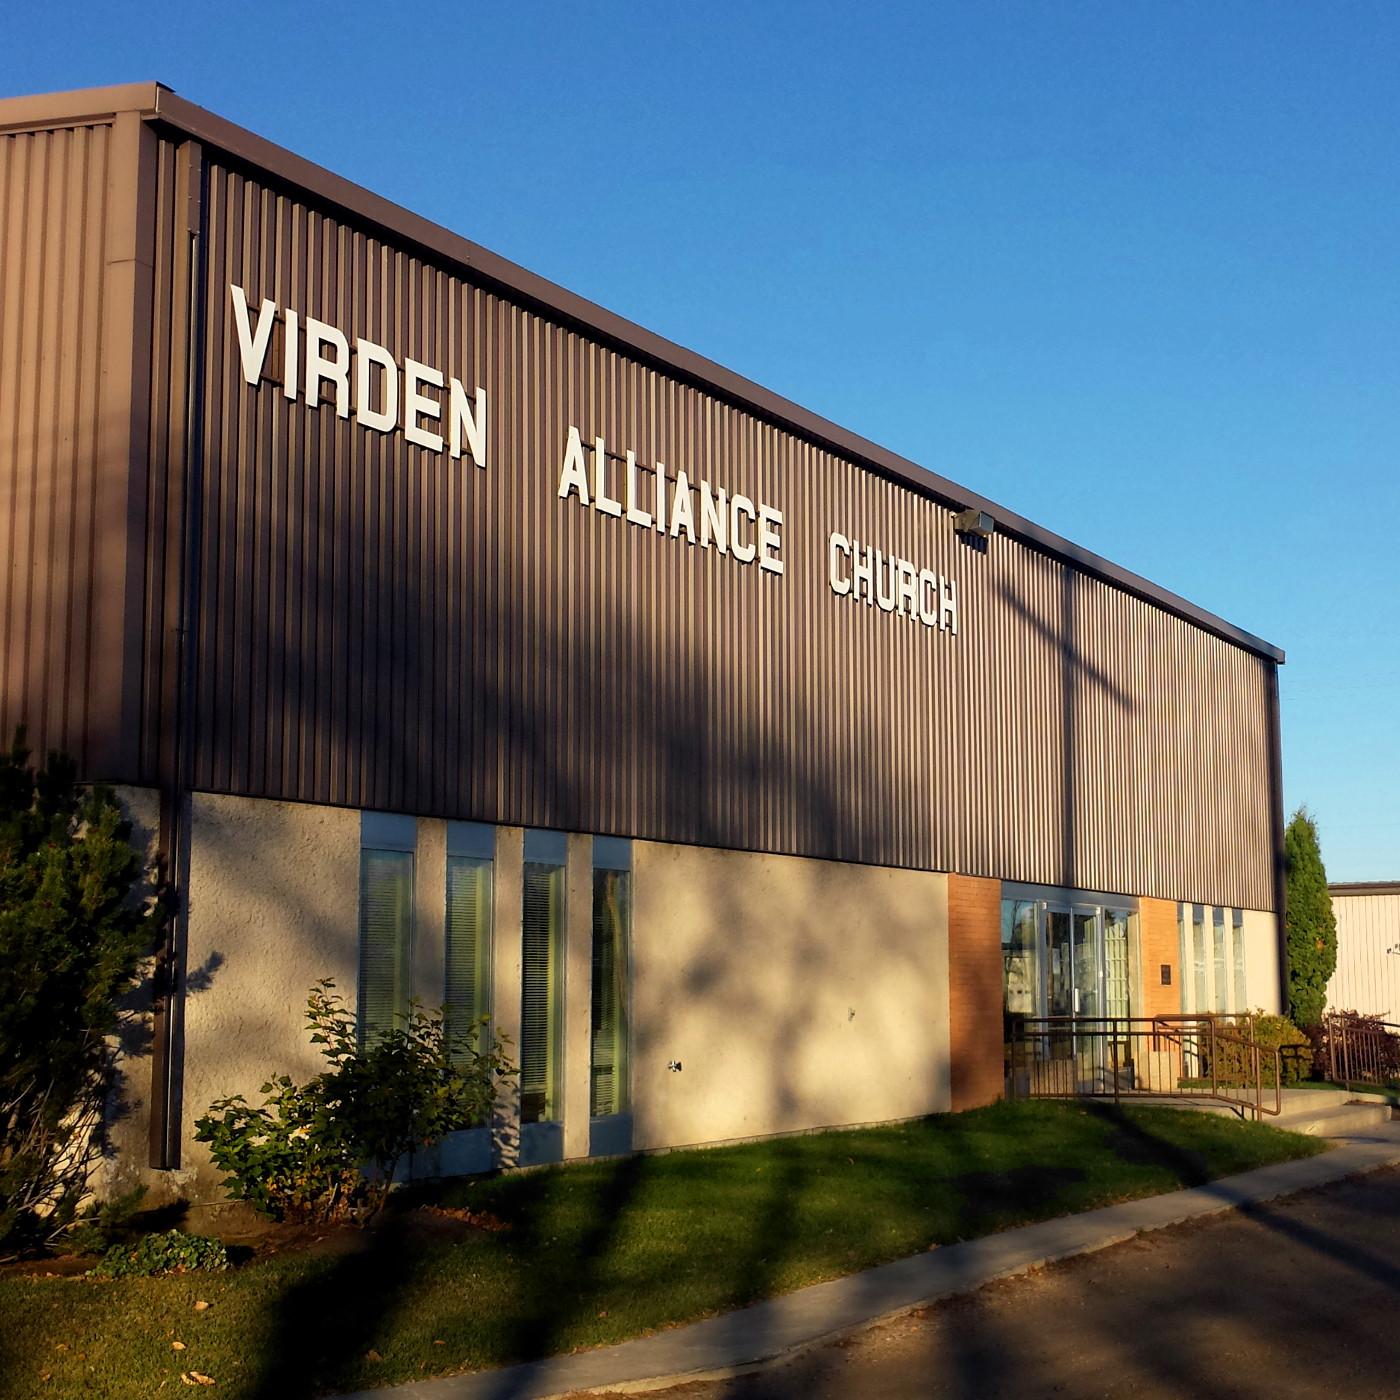 Virden Alliance Church